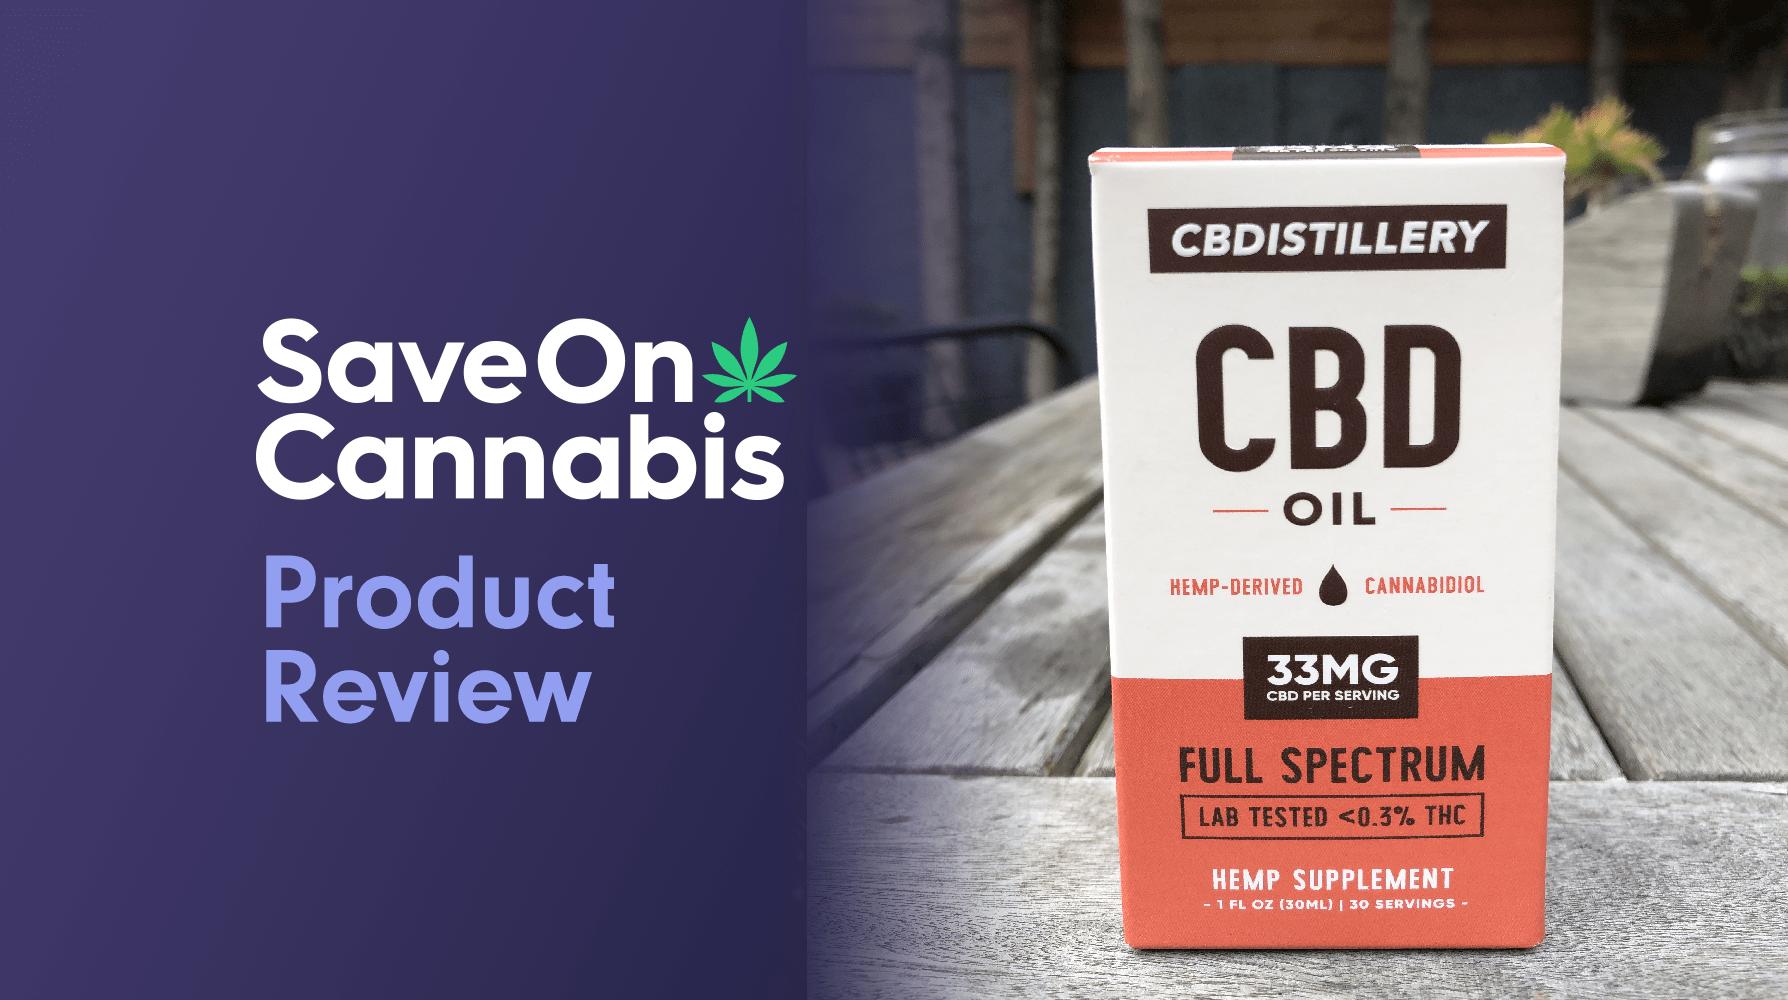 cbdistillery full spectrum cbd oil 1,000 mg review save on cannabis website